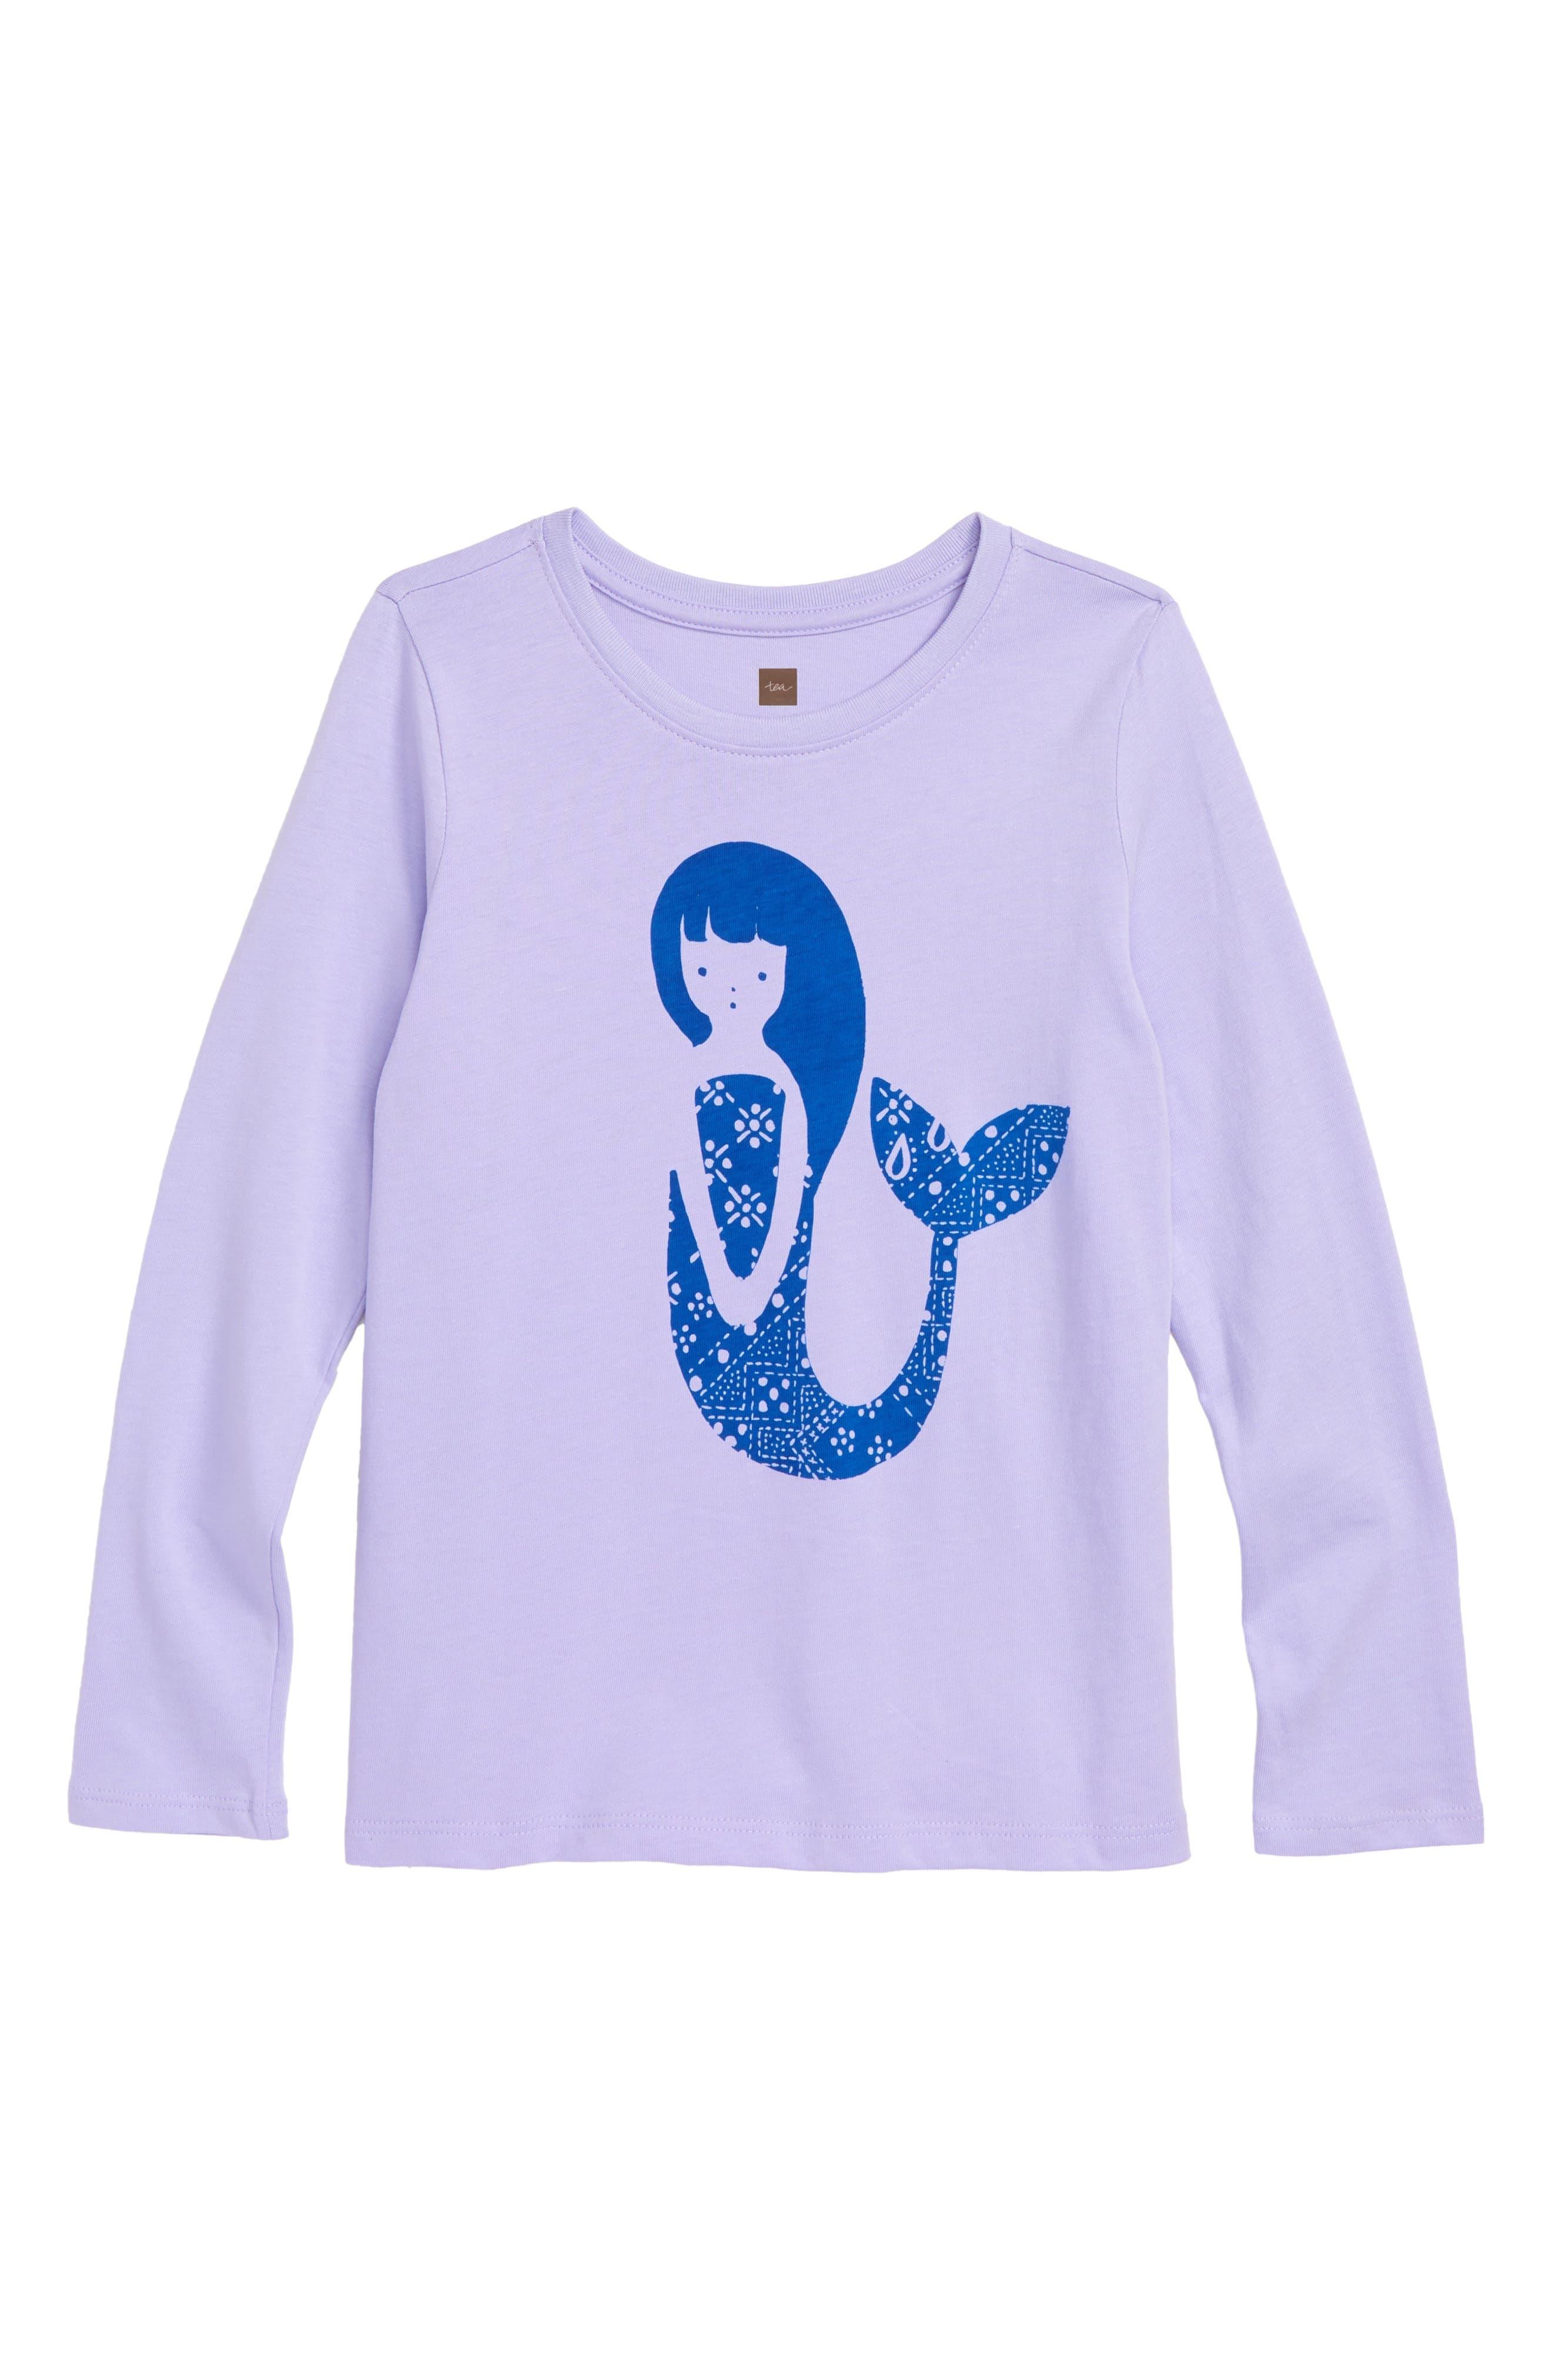 Mermaid Graphic Tee,                         Main,                         color, LILAC MIST